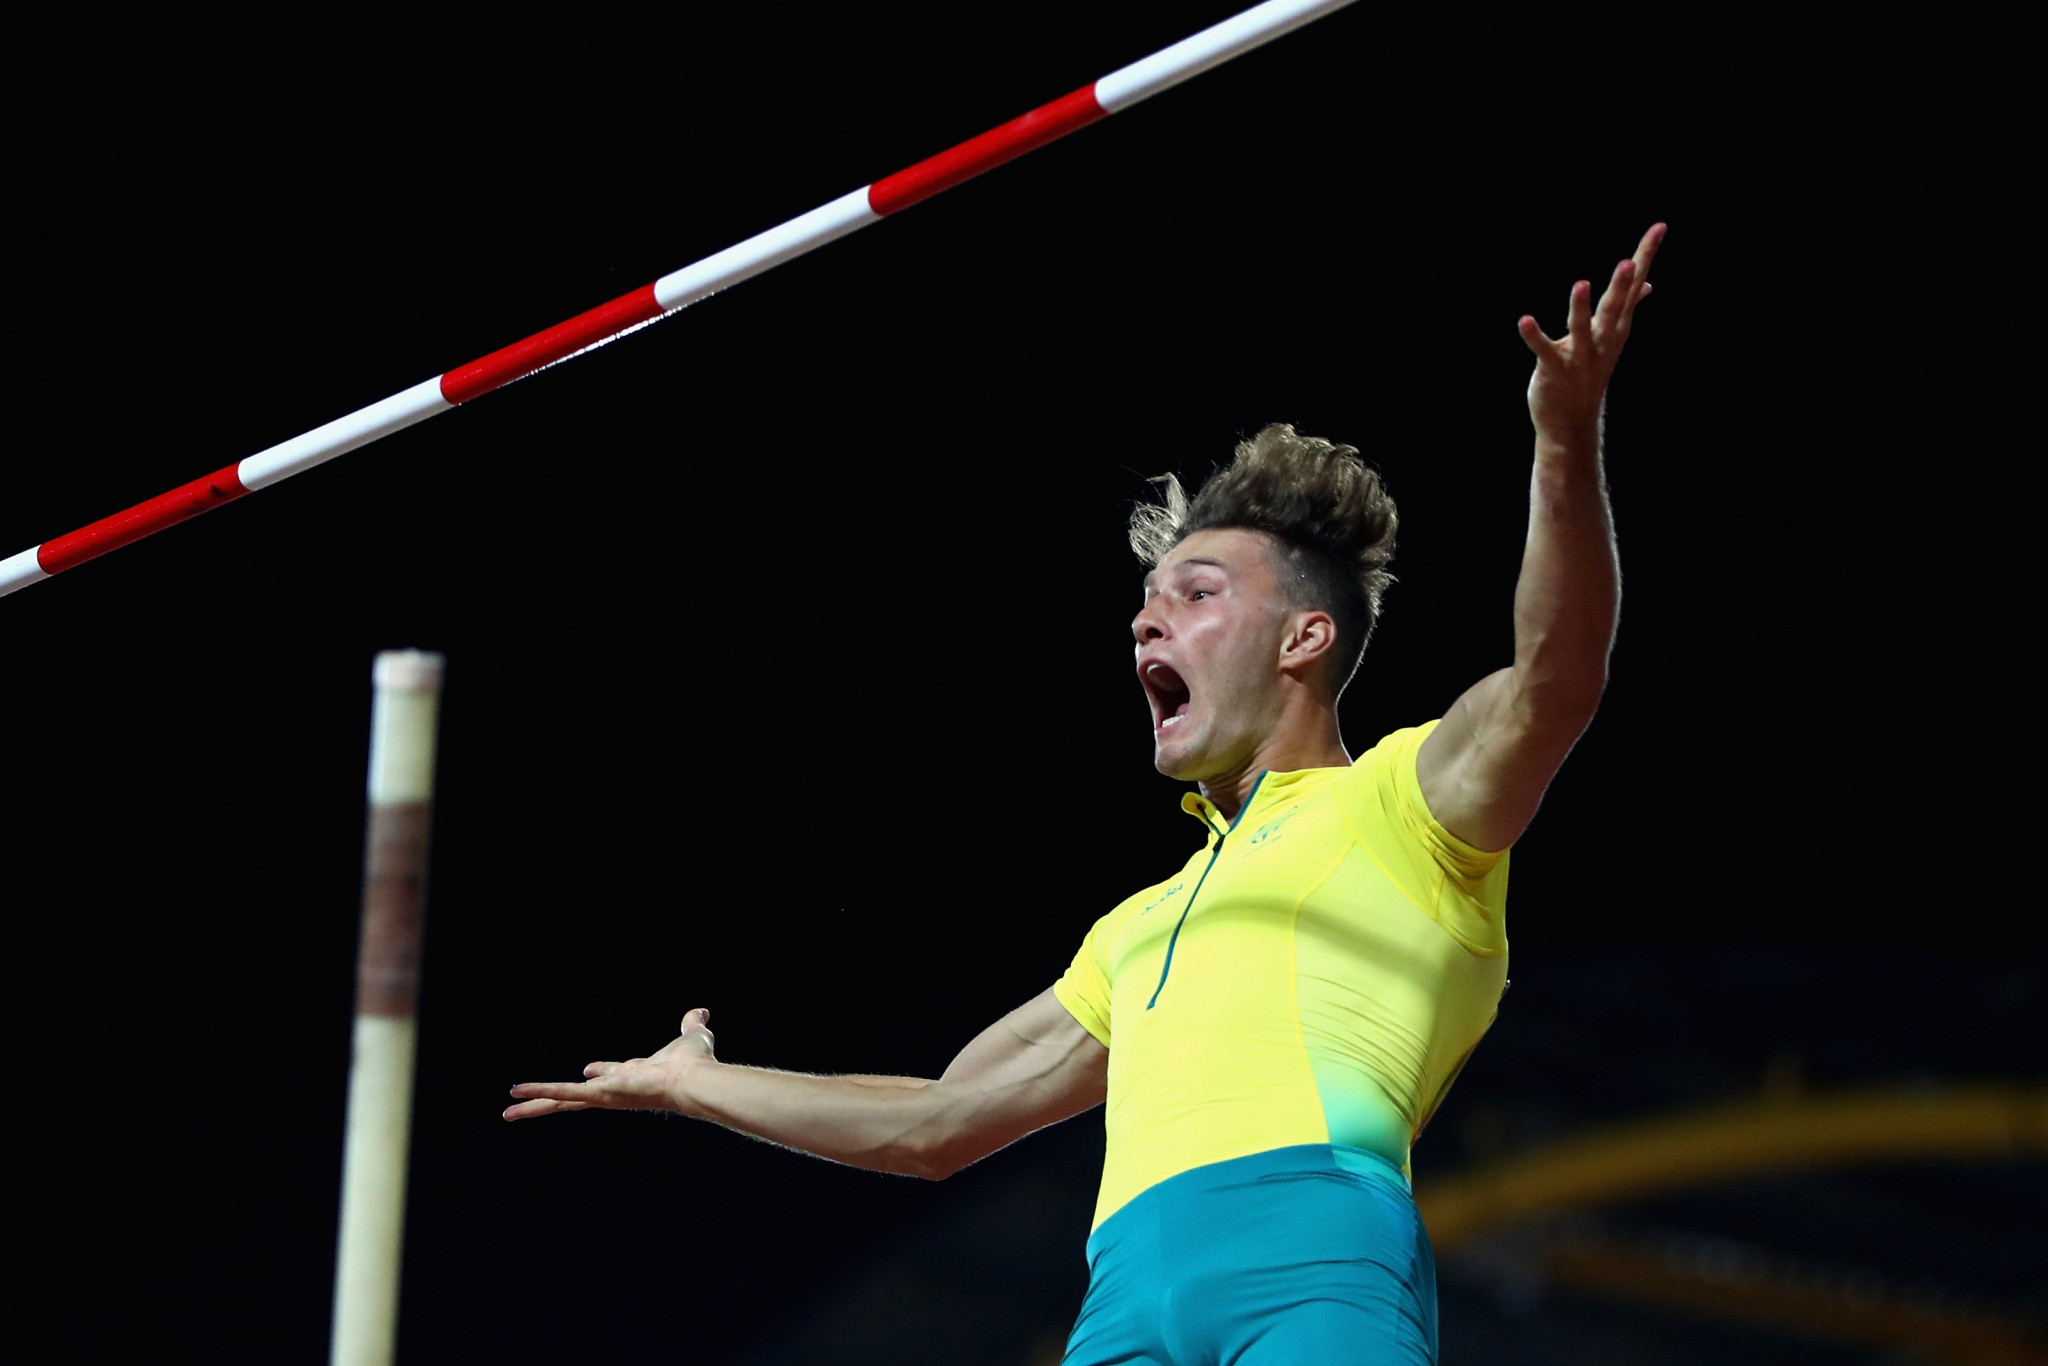 Kurtis Marschall won the men's pole vault final for the host nation ©Getty Images